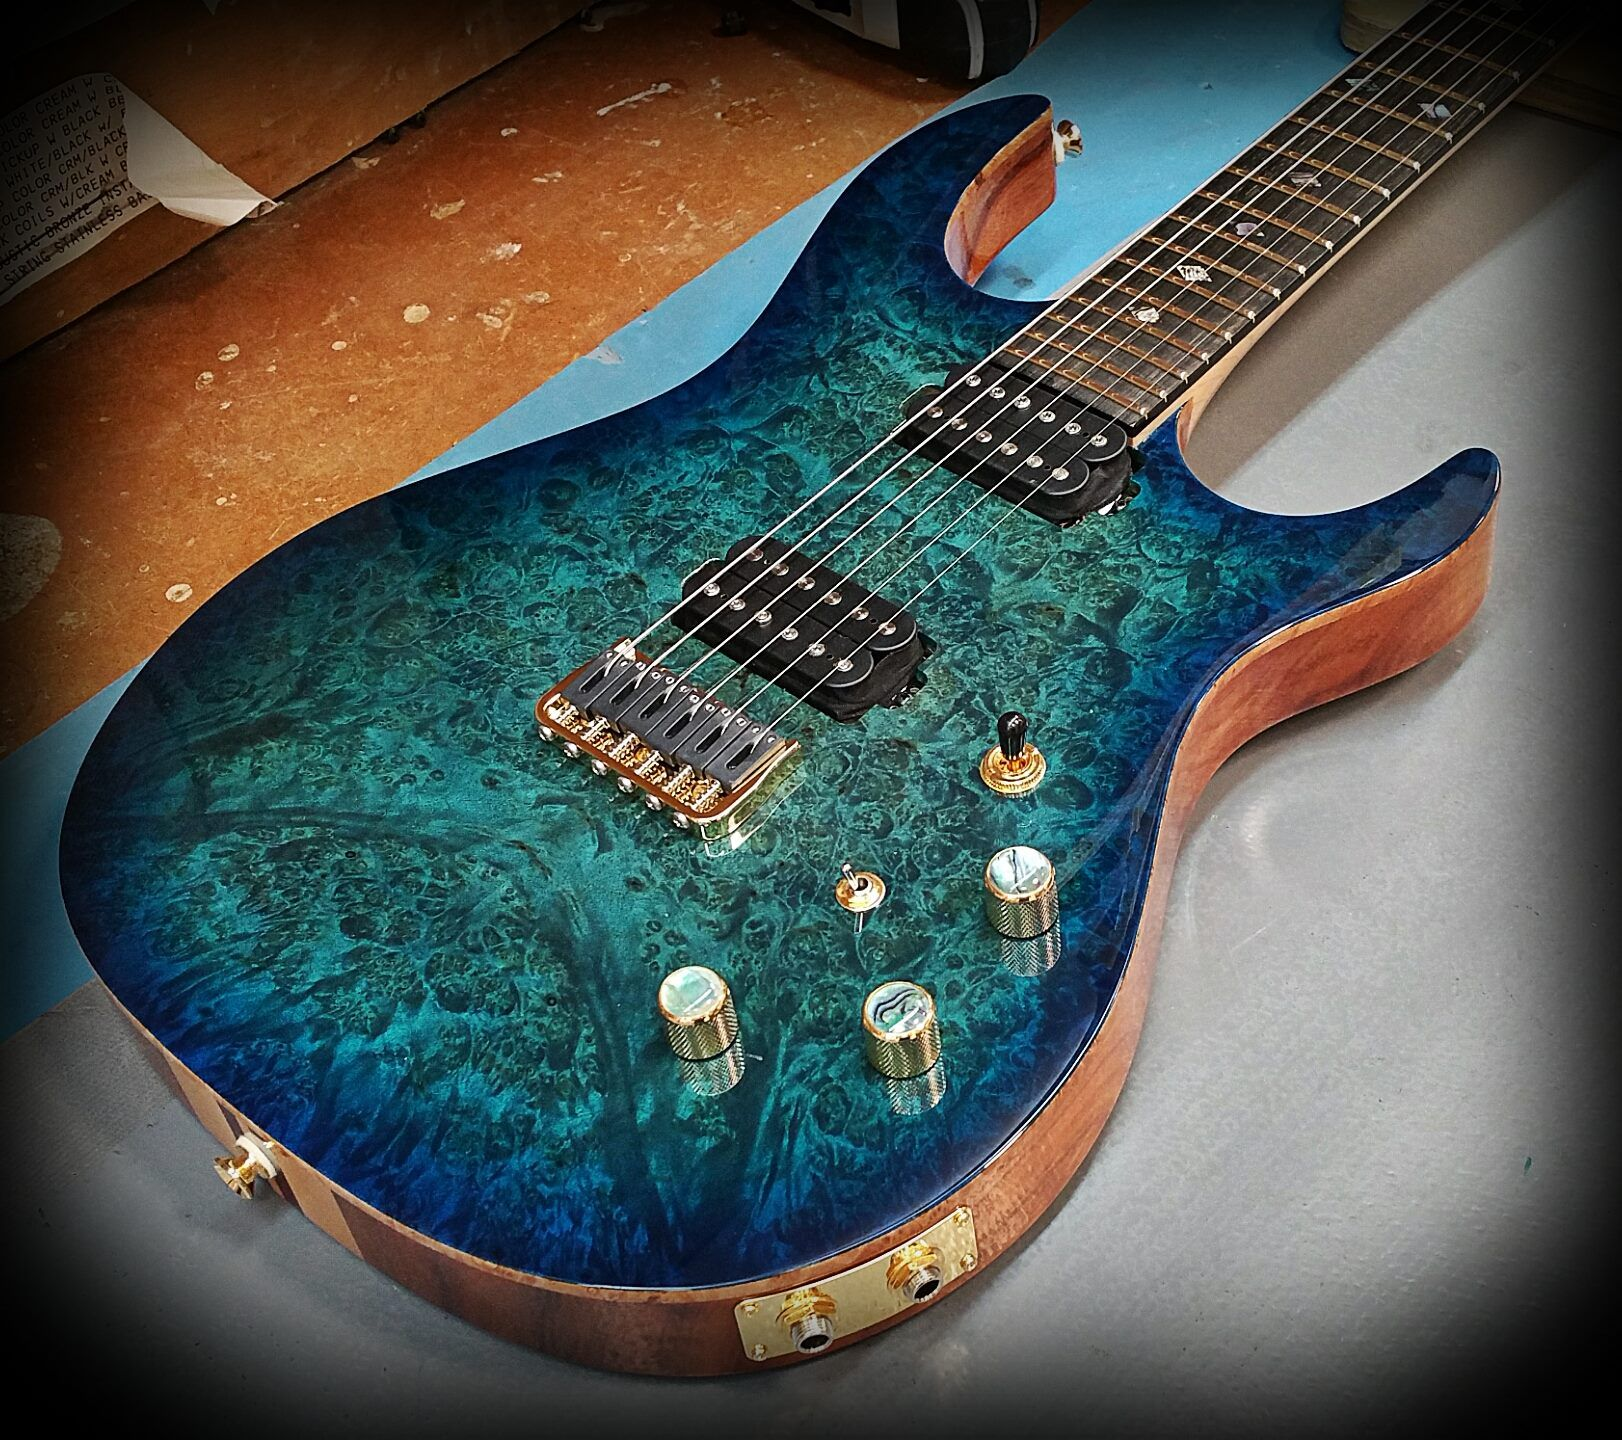 medium resolution of kiesel guitars carvin guitars lmp6translucent aquaburst over burl maple top on koa body